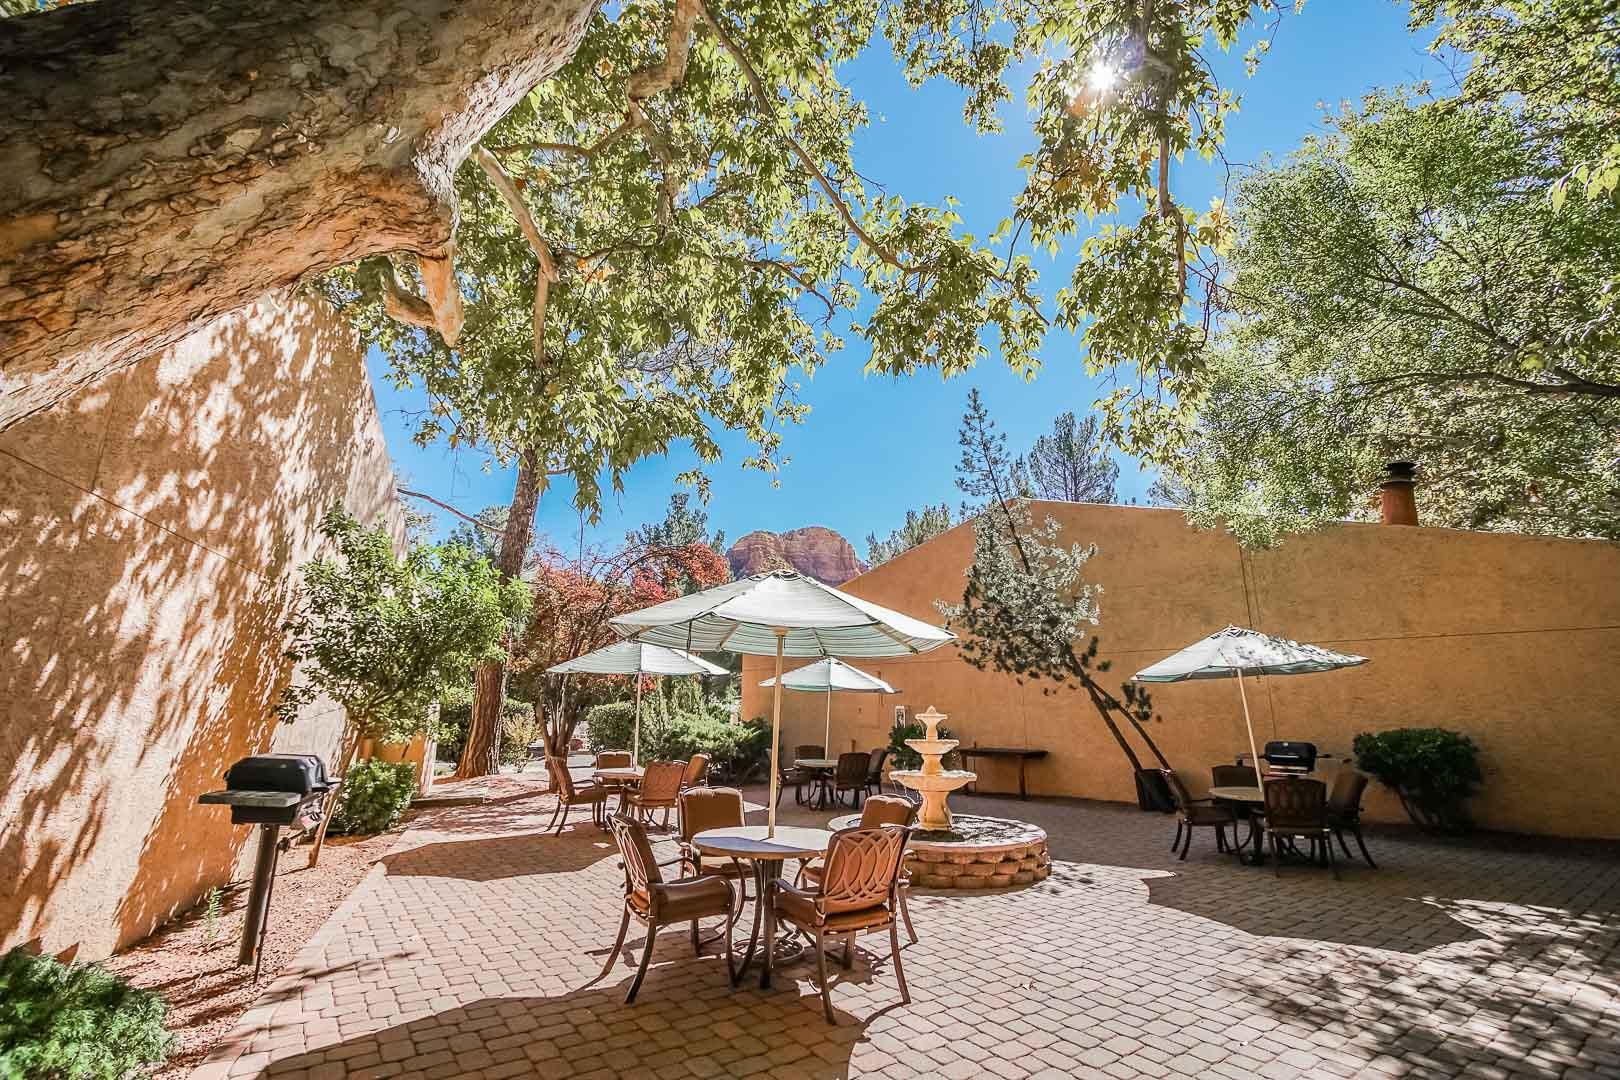 A peaceful view of the outdoor tables at VRI's Villas at Poco Diablo in Sedona, Arizona.